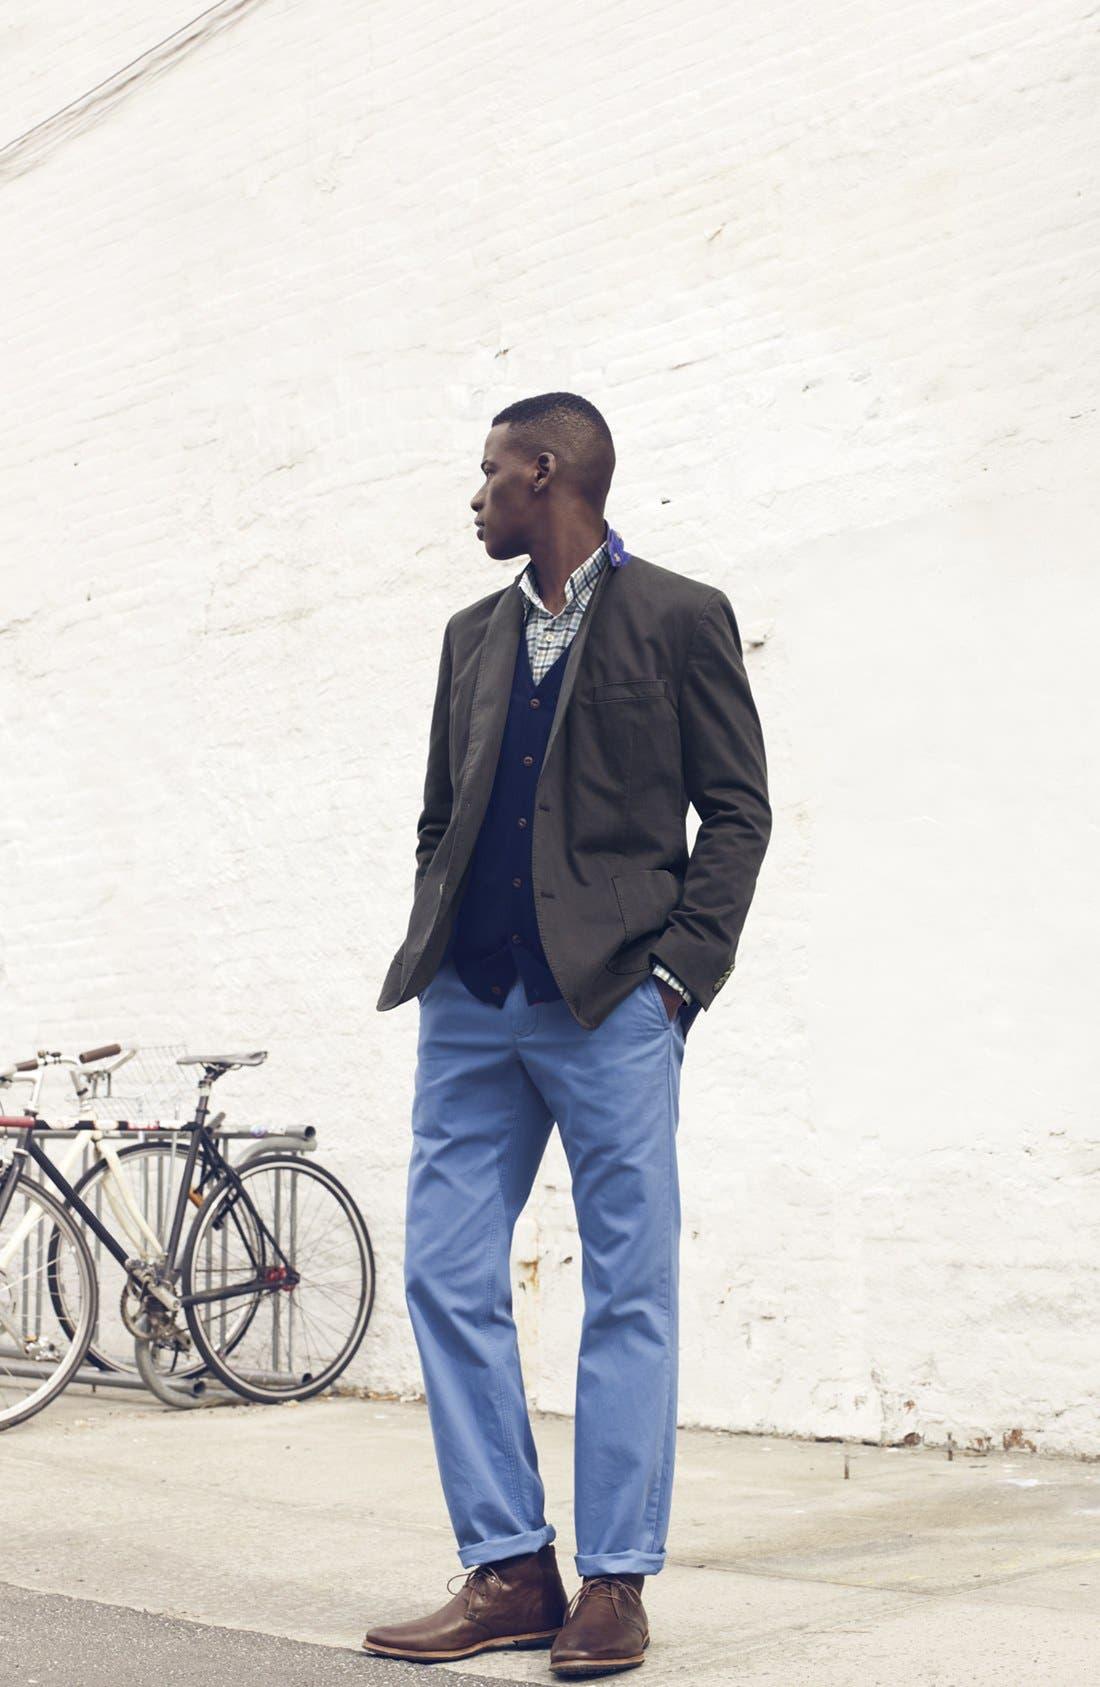 Alternate Image 1 Selected - Kroon Sportcoat, Peter Millar Sport Shirt & Bonobos Chinos